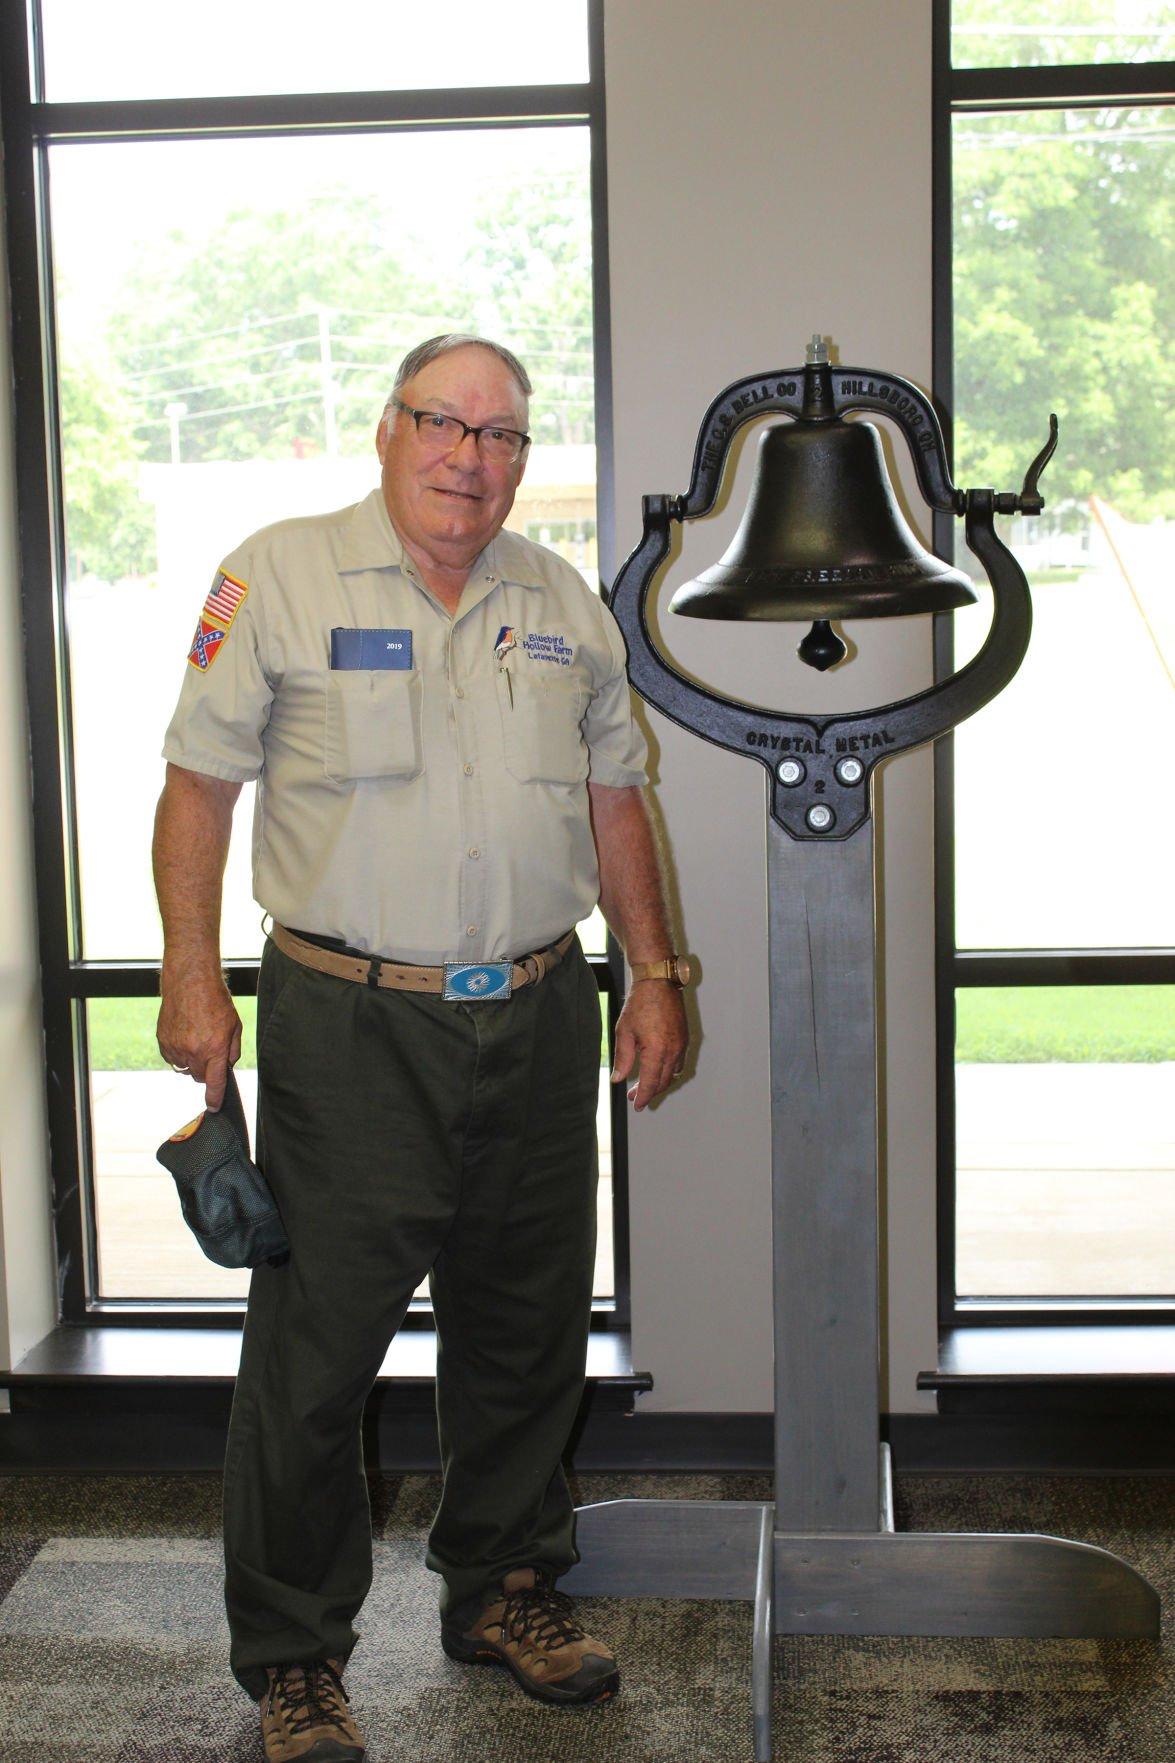 Cast Iron Farm Dinner Bell Up For Grabs Public Charity Benefits Lifestyles Northwestgeorgianews Com